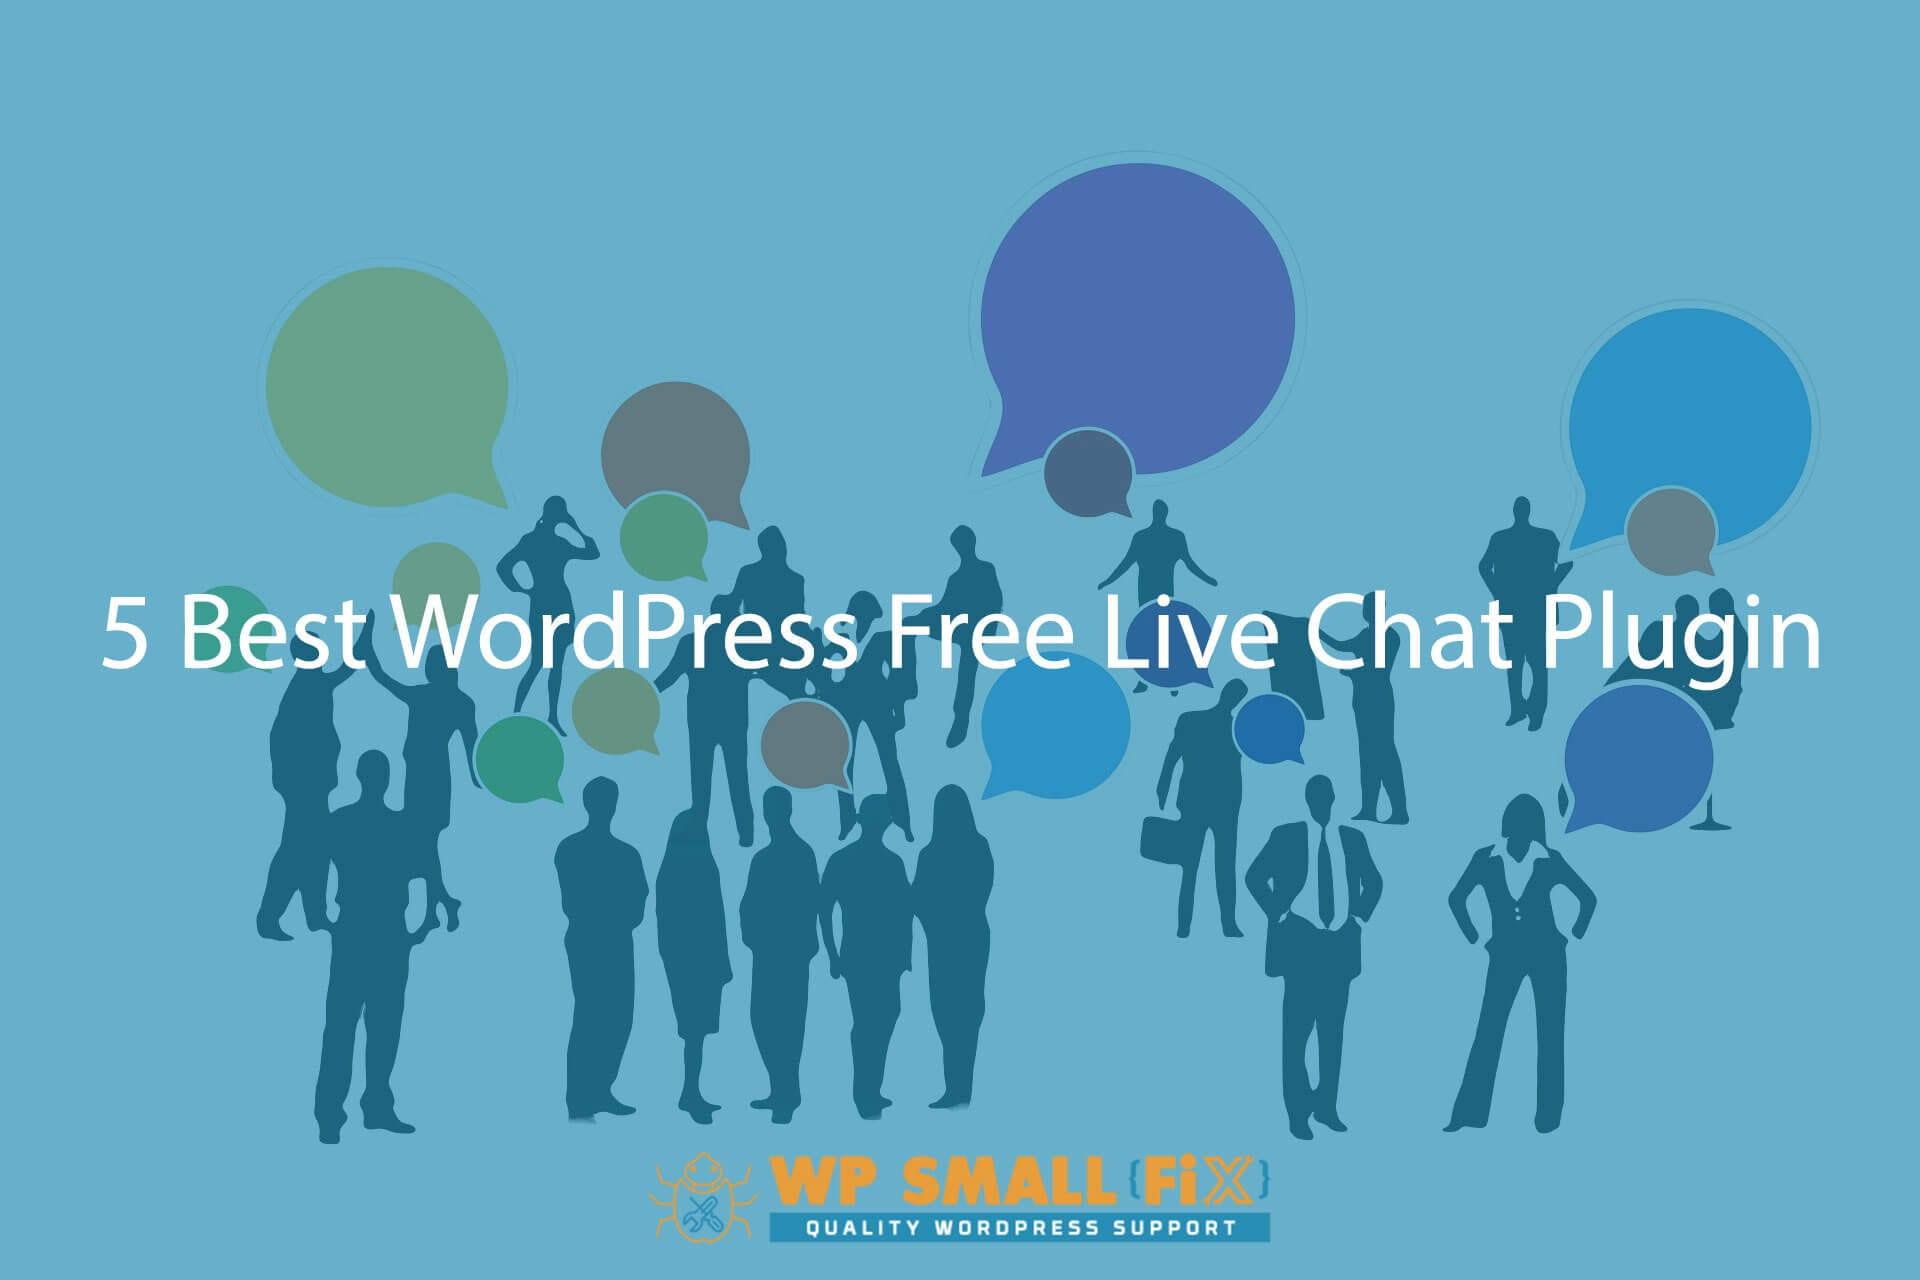 5-Best-WordPress-Free-Live-Chat-Plugin